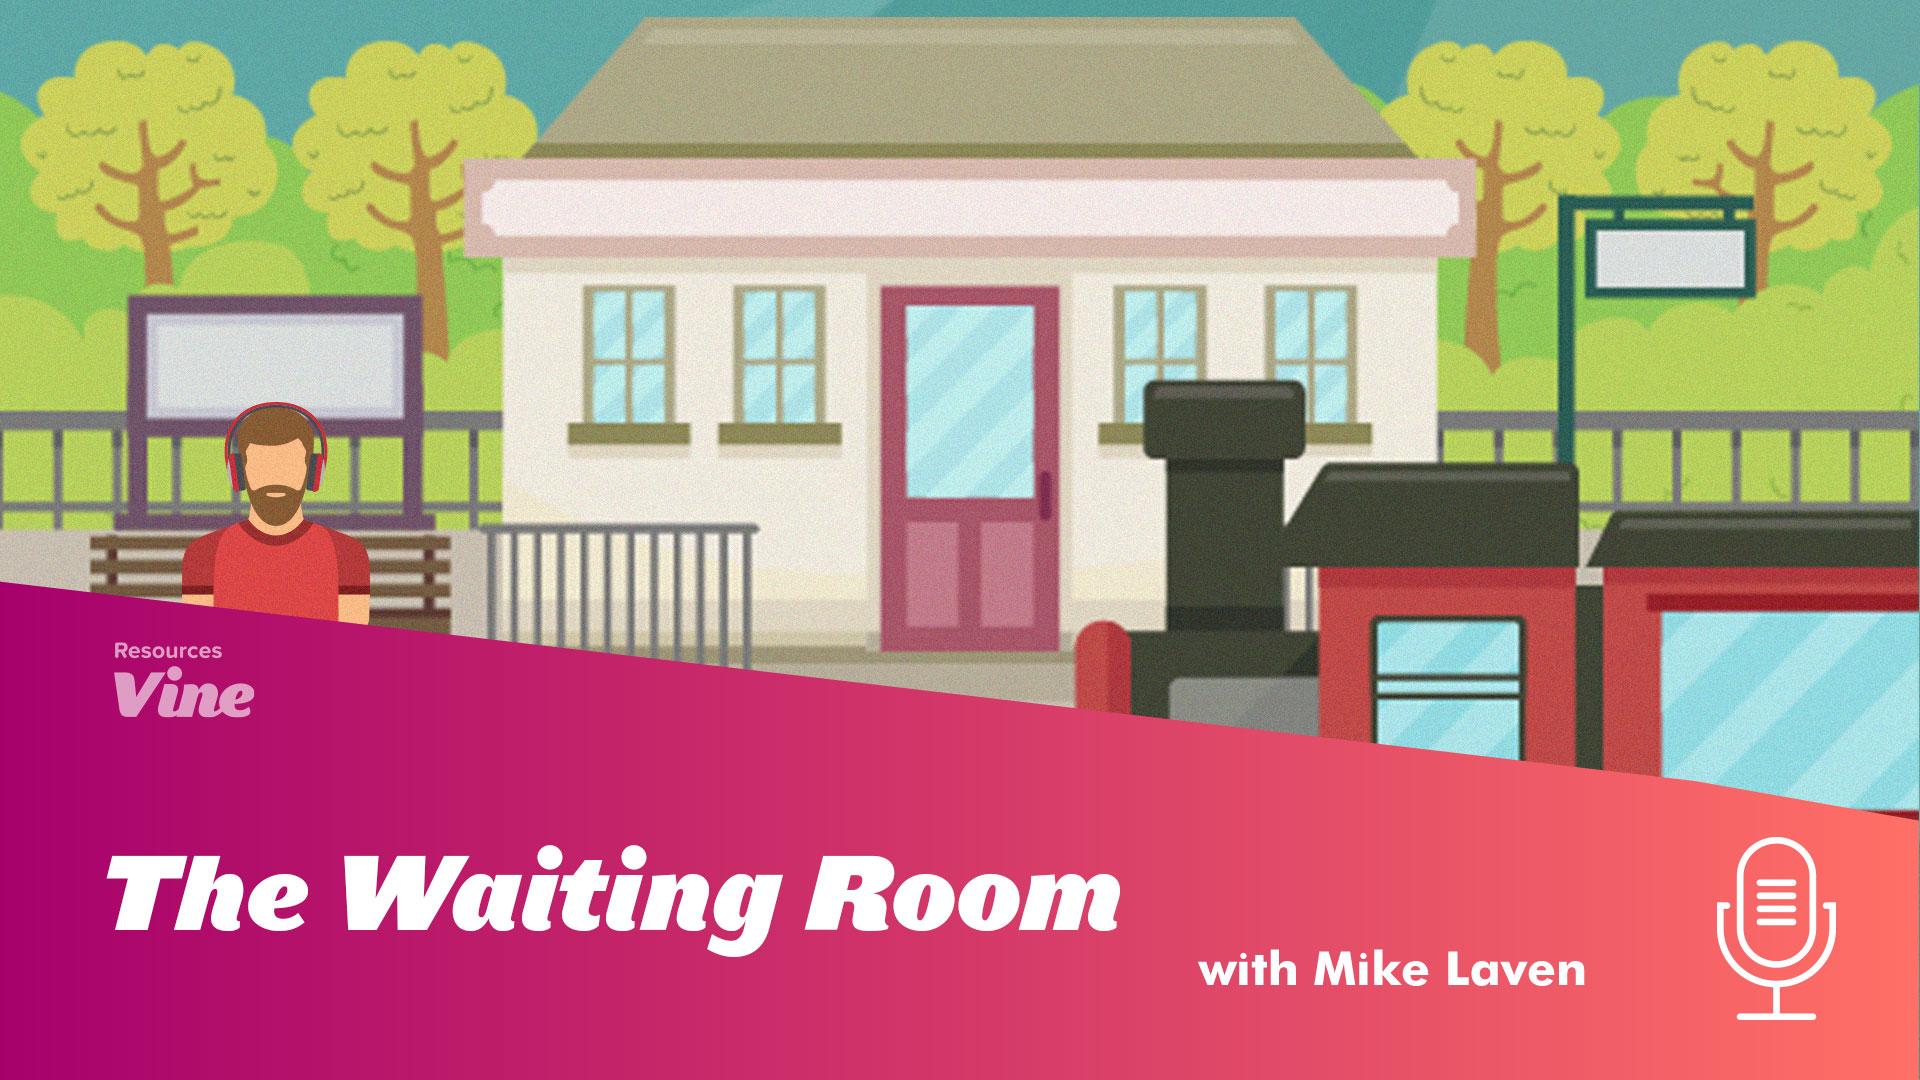 Thumbnail_The_Waiting_Room_ML